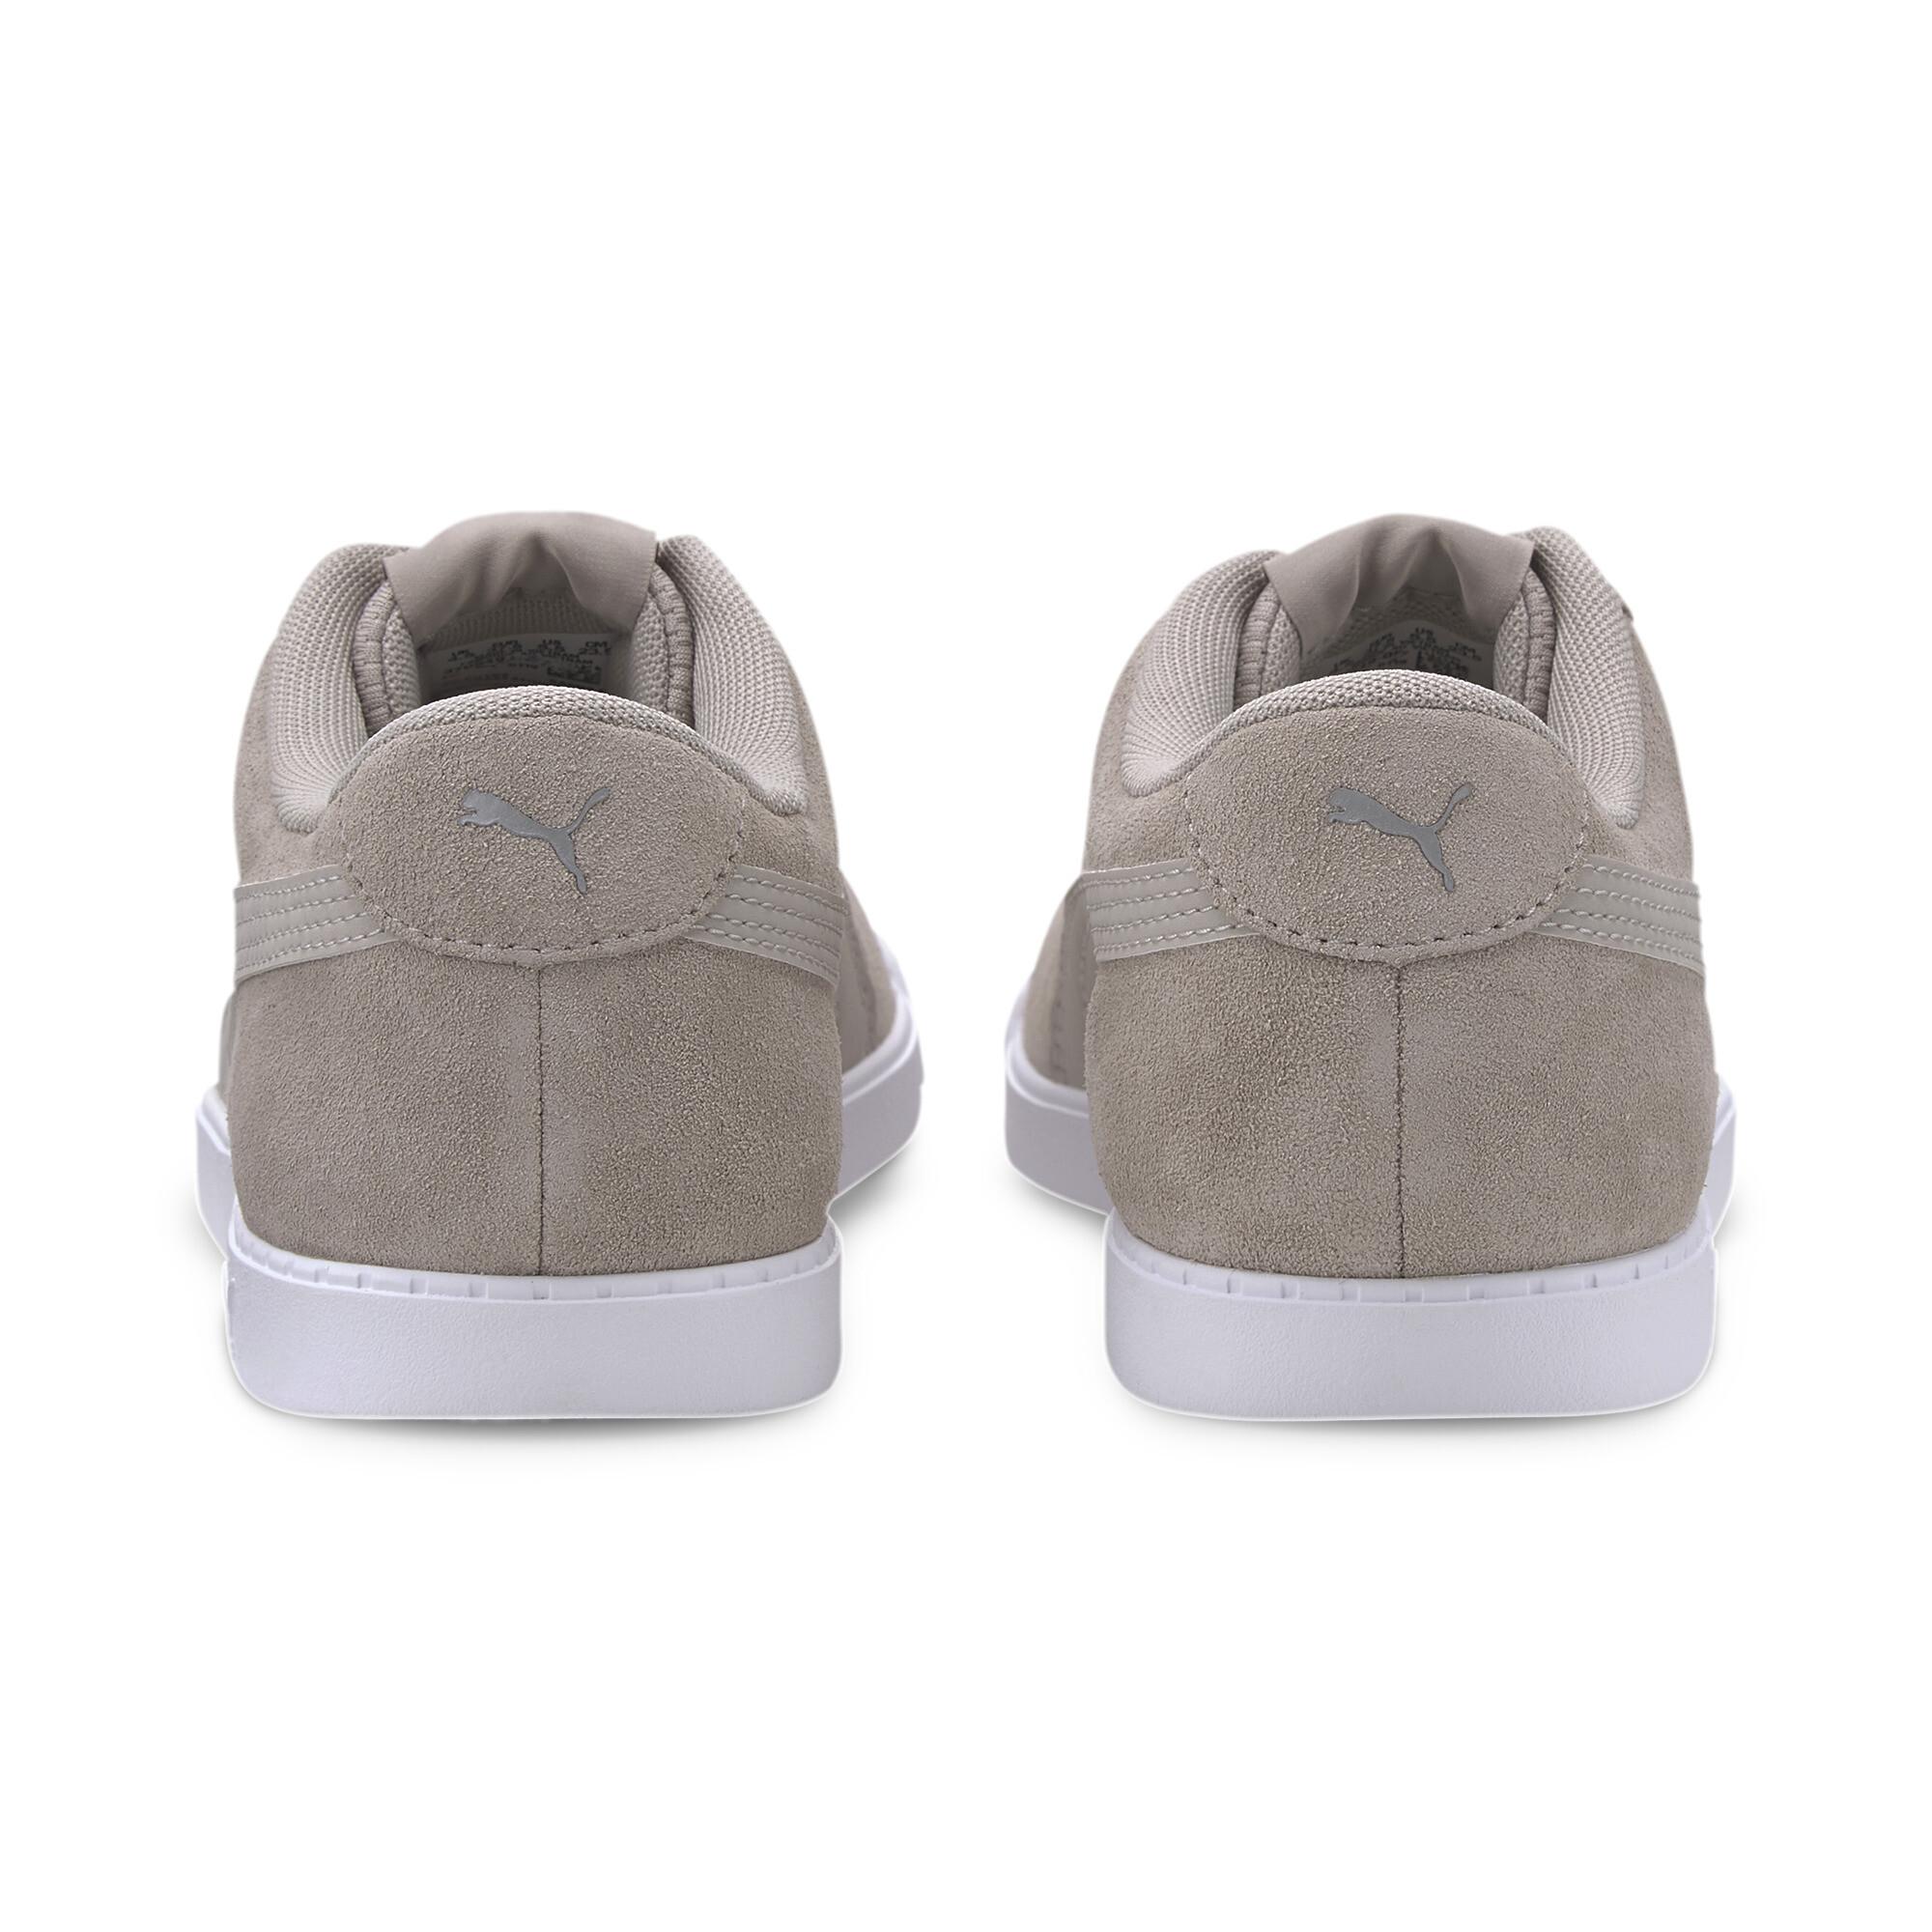 PUMA-Women-039-s-Carina-Slim-Suede-Sneakers thumbnail 3